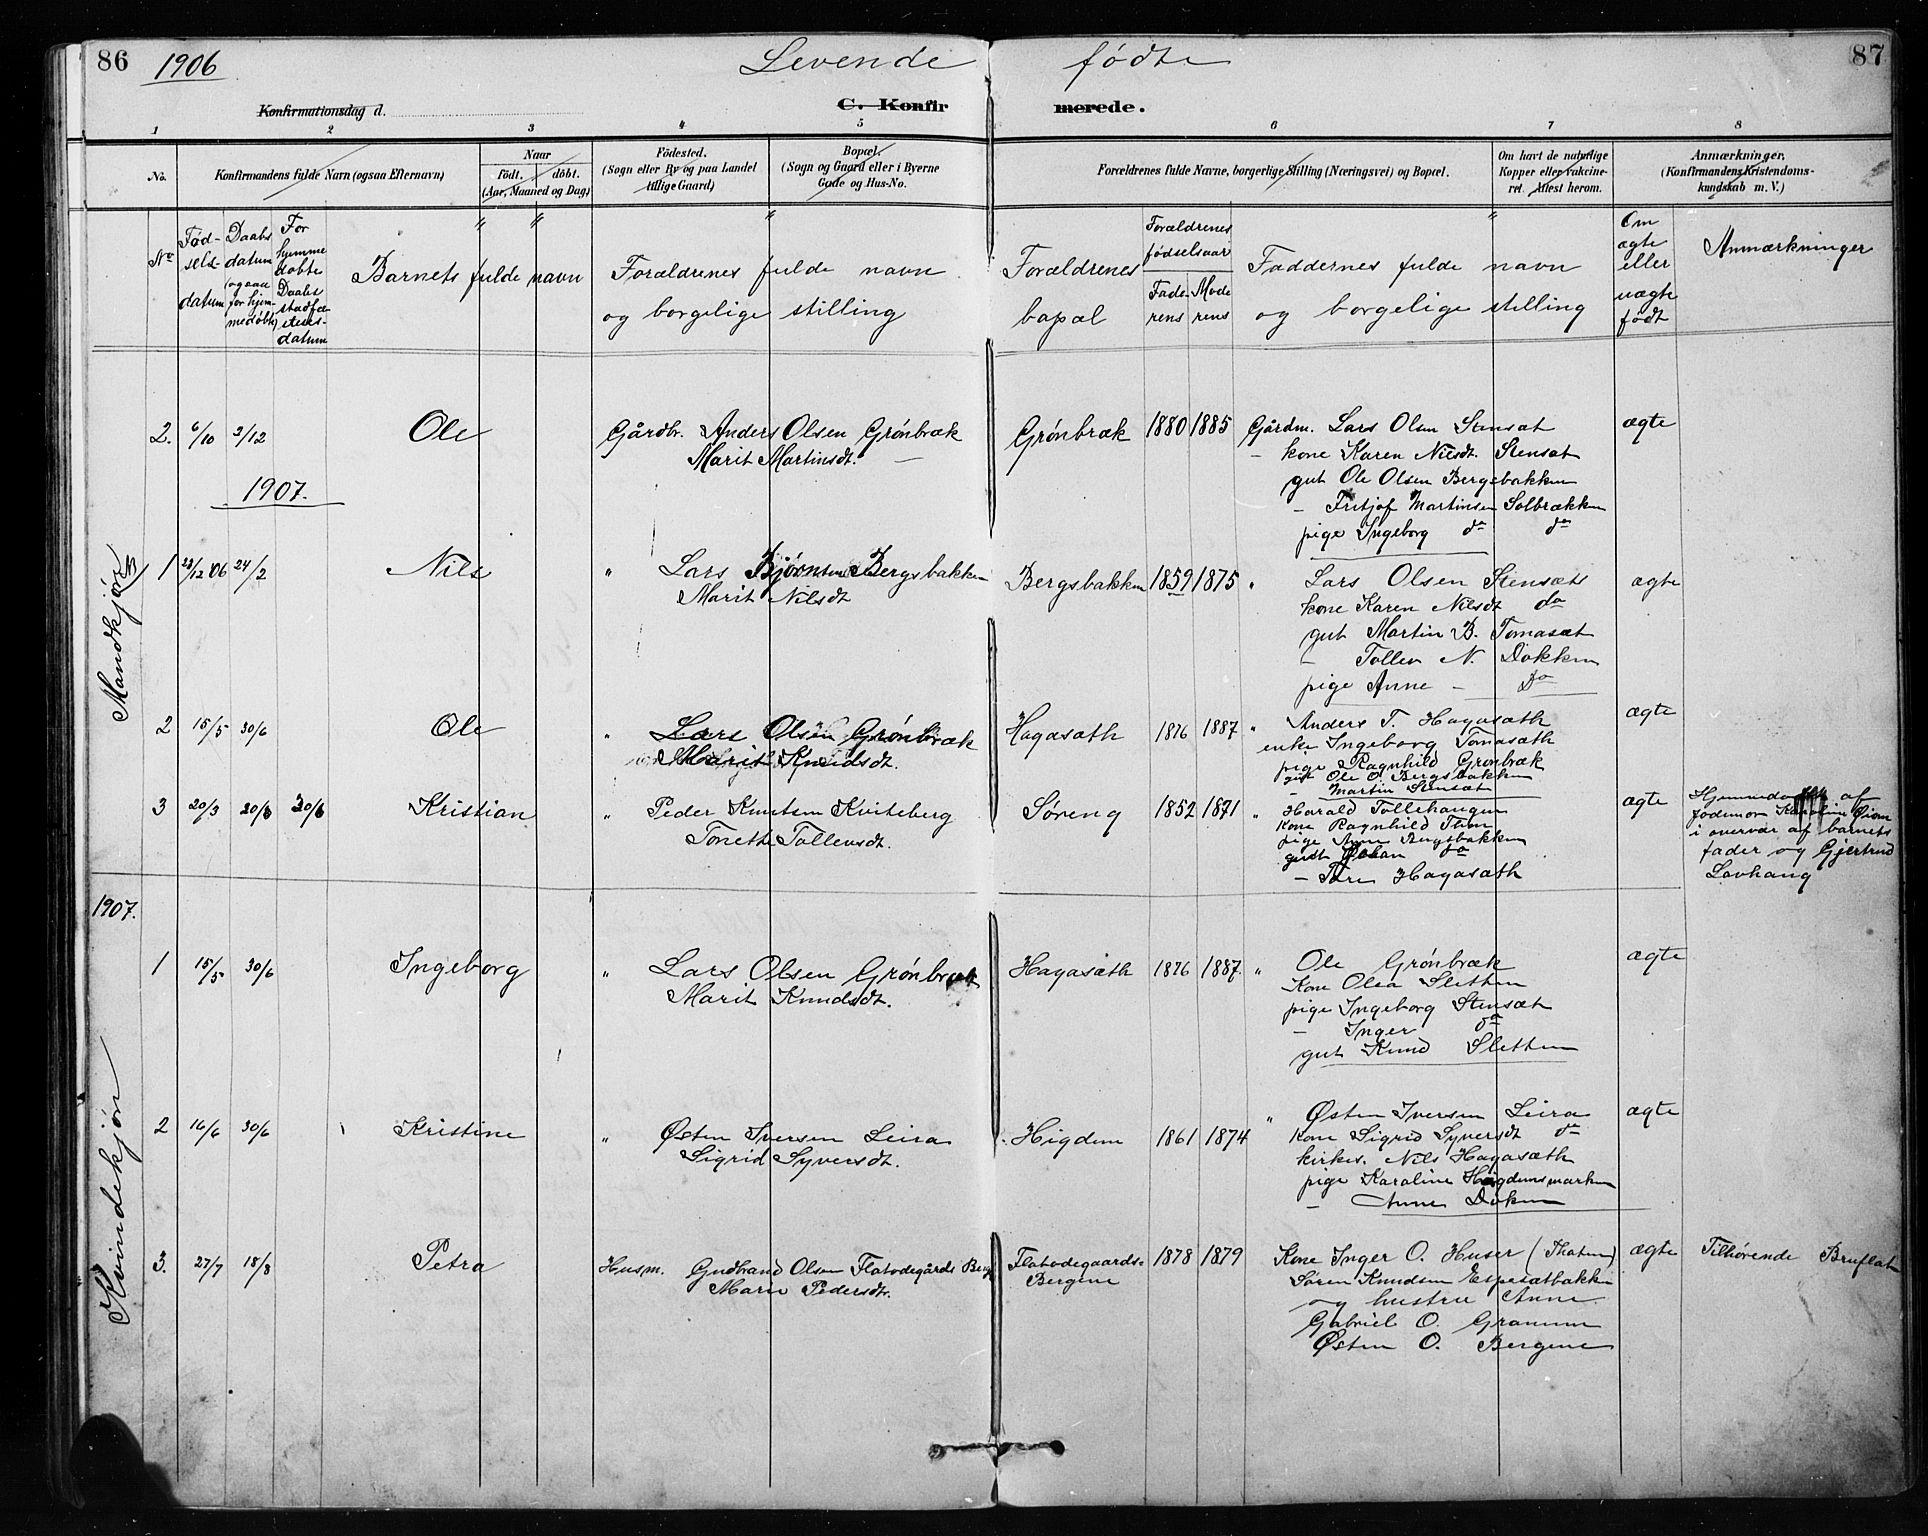 SAH, Etnedal prestekontor, H/Ha/Hab/Habb/L0001: Klokkerbok nr. II 1, 1894-1911, s. 86-87